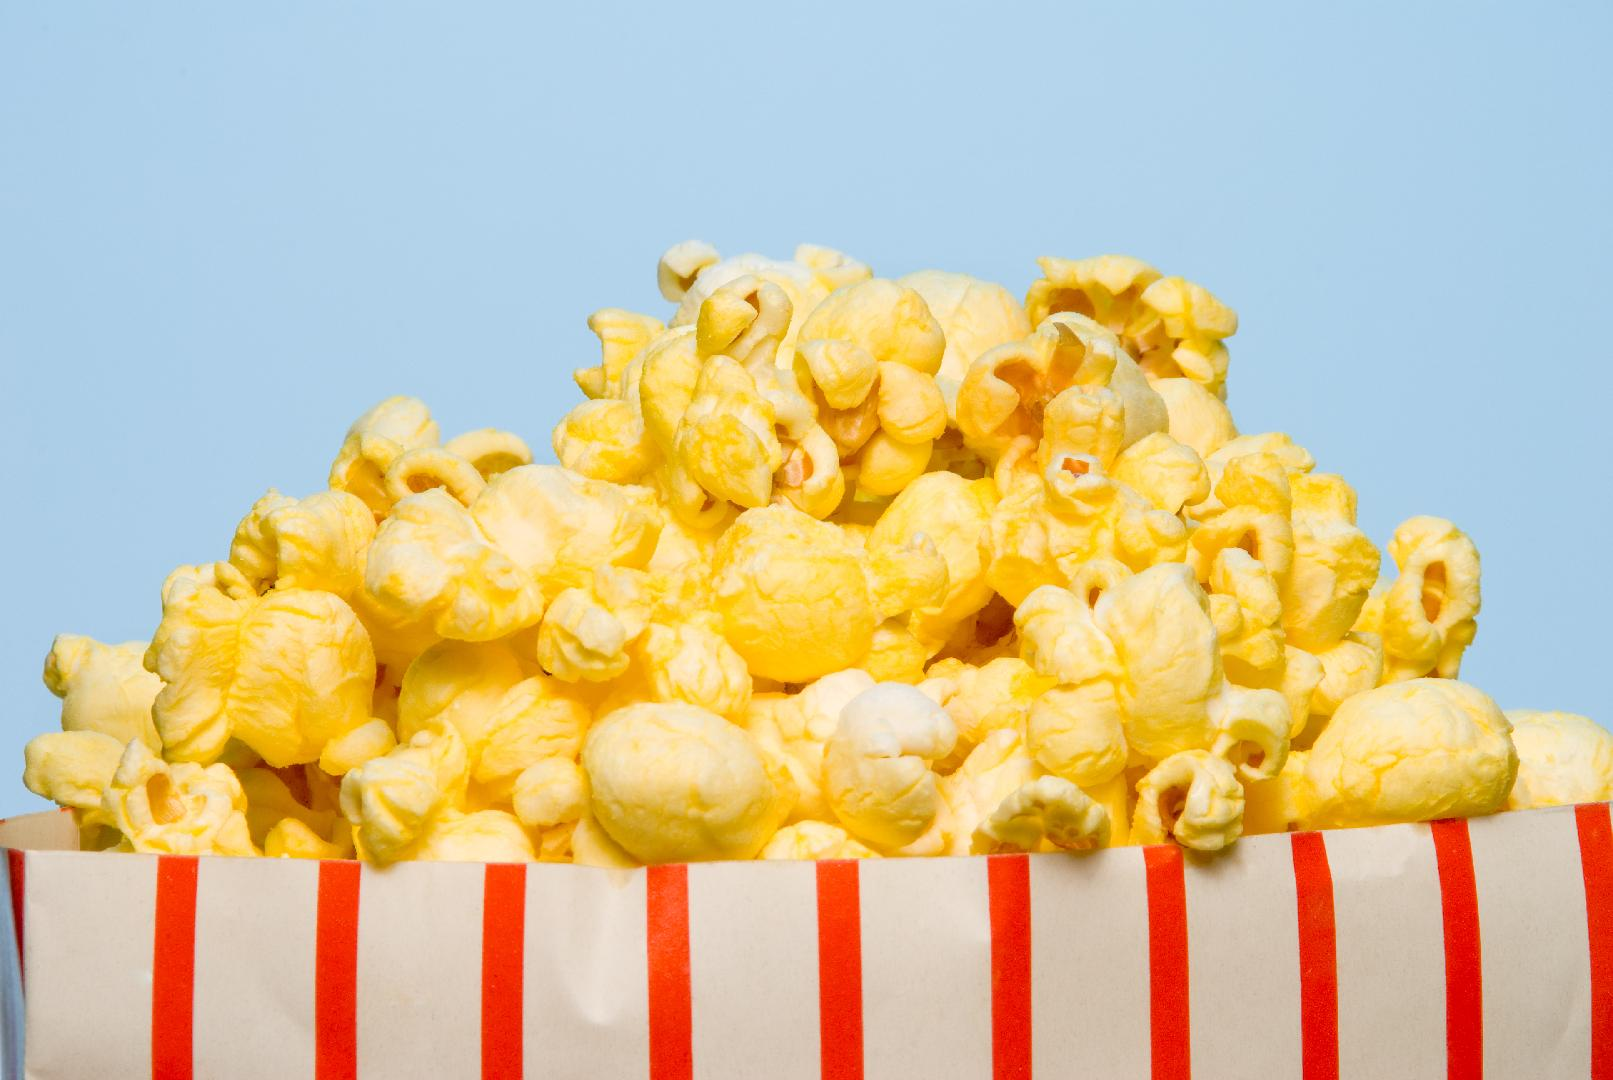 Dani Paluchniak Thinks You Deserve Better Than Microwave Popcorn